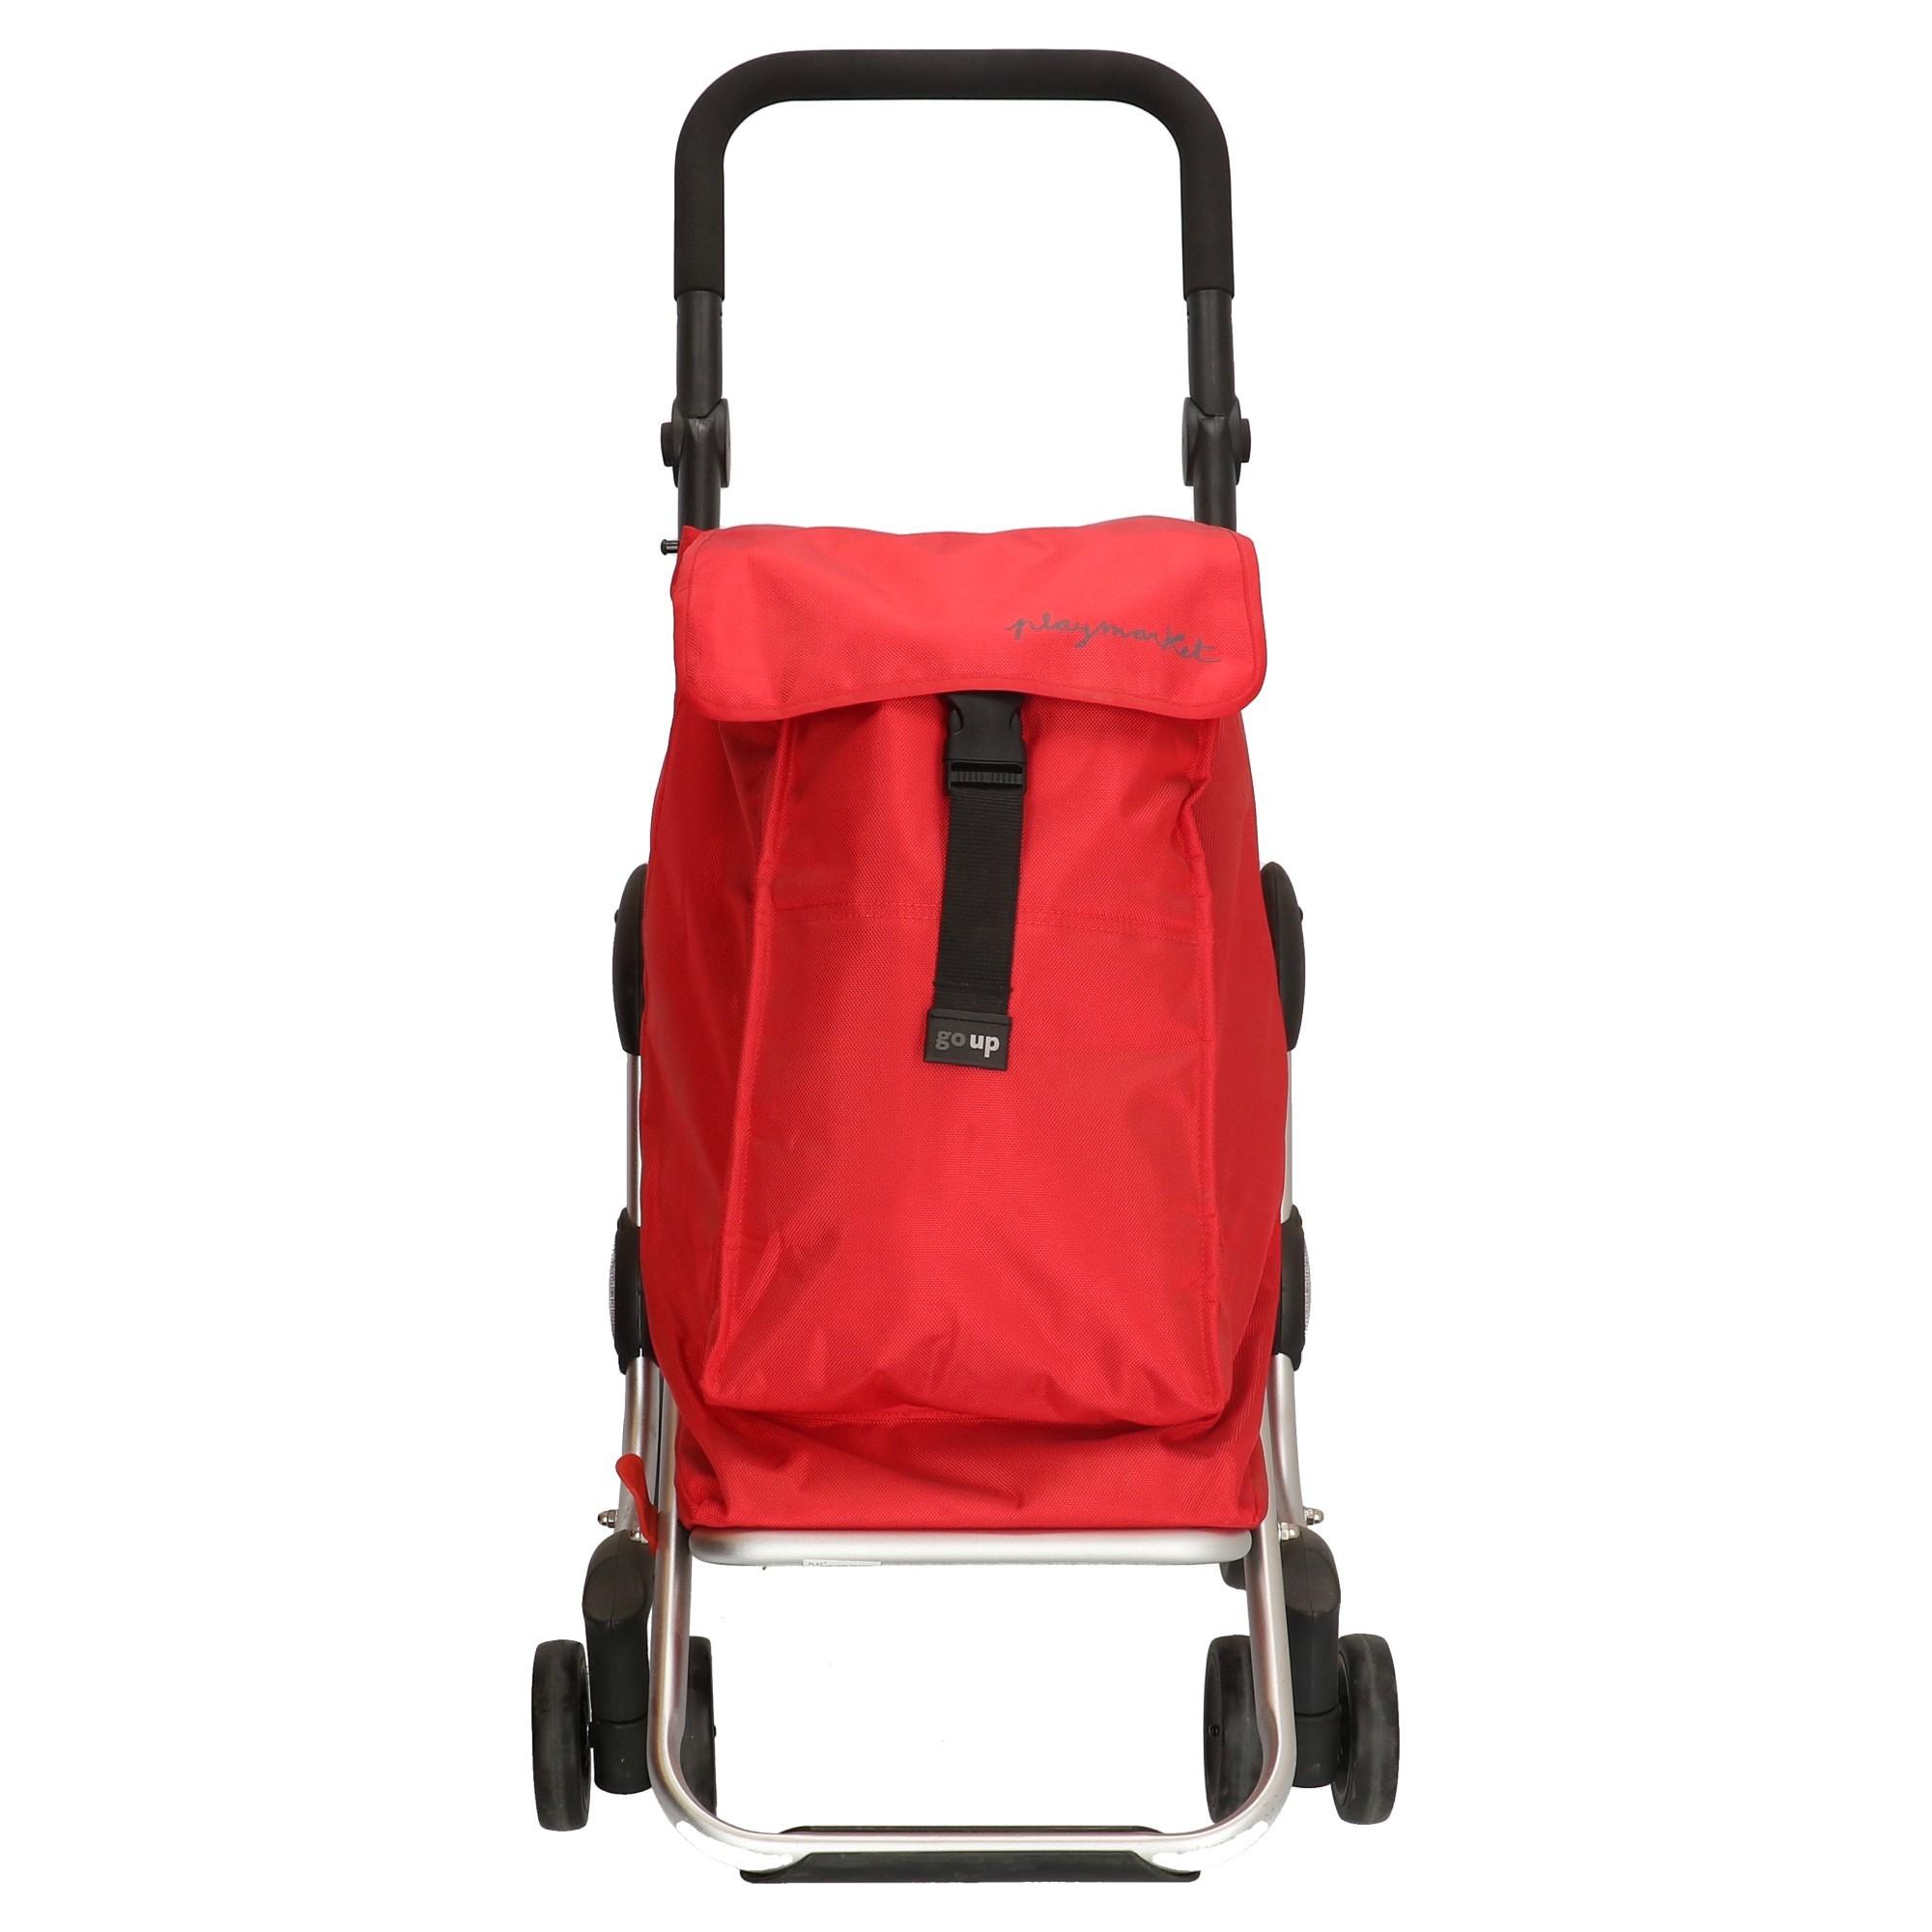 Playmarket Go Up Boodschappentrolley rood